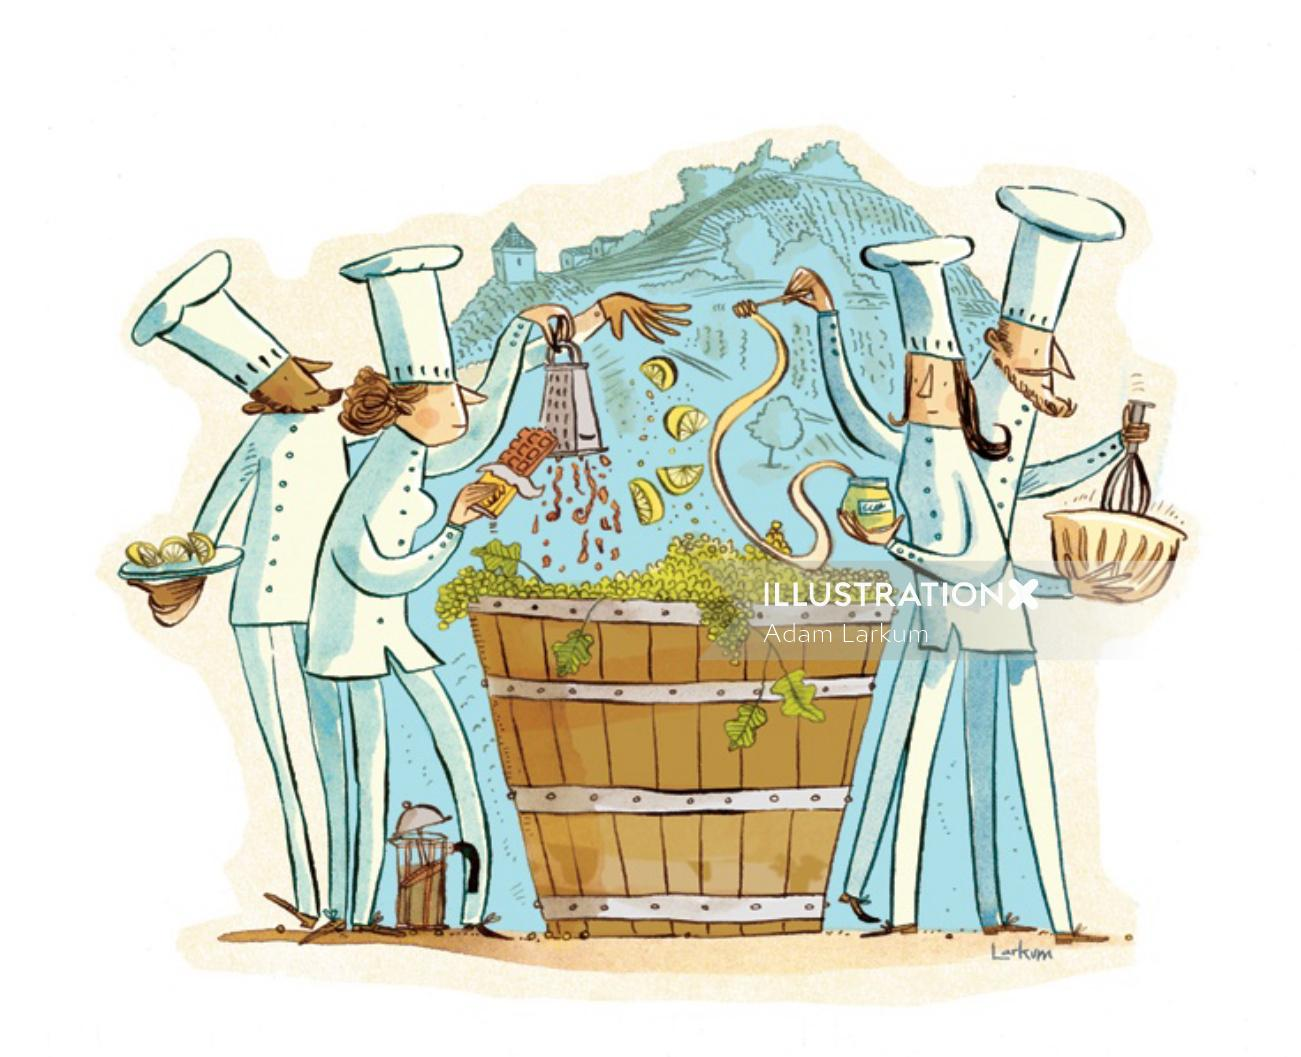 Editorial illustration of wine making